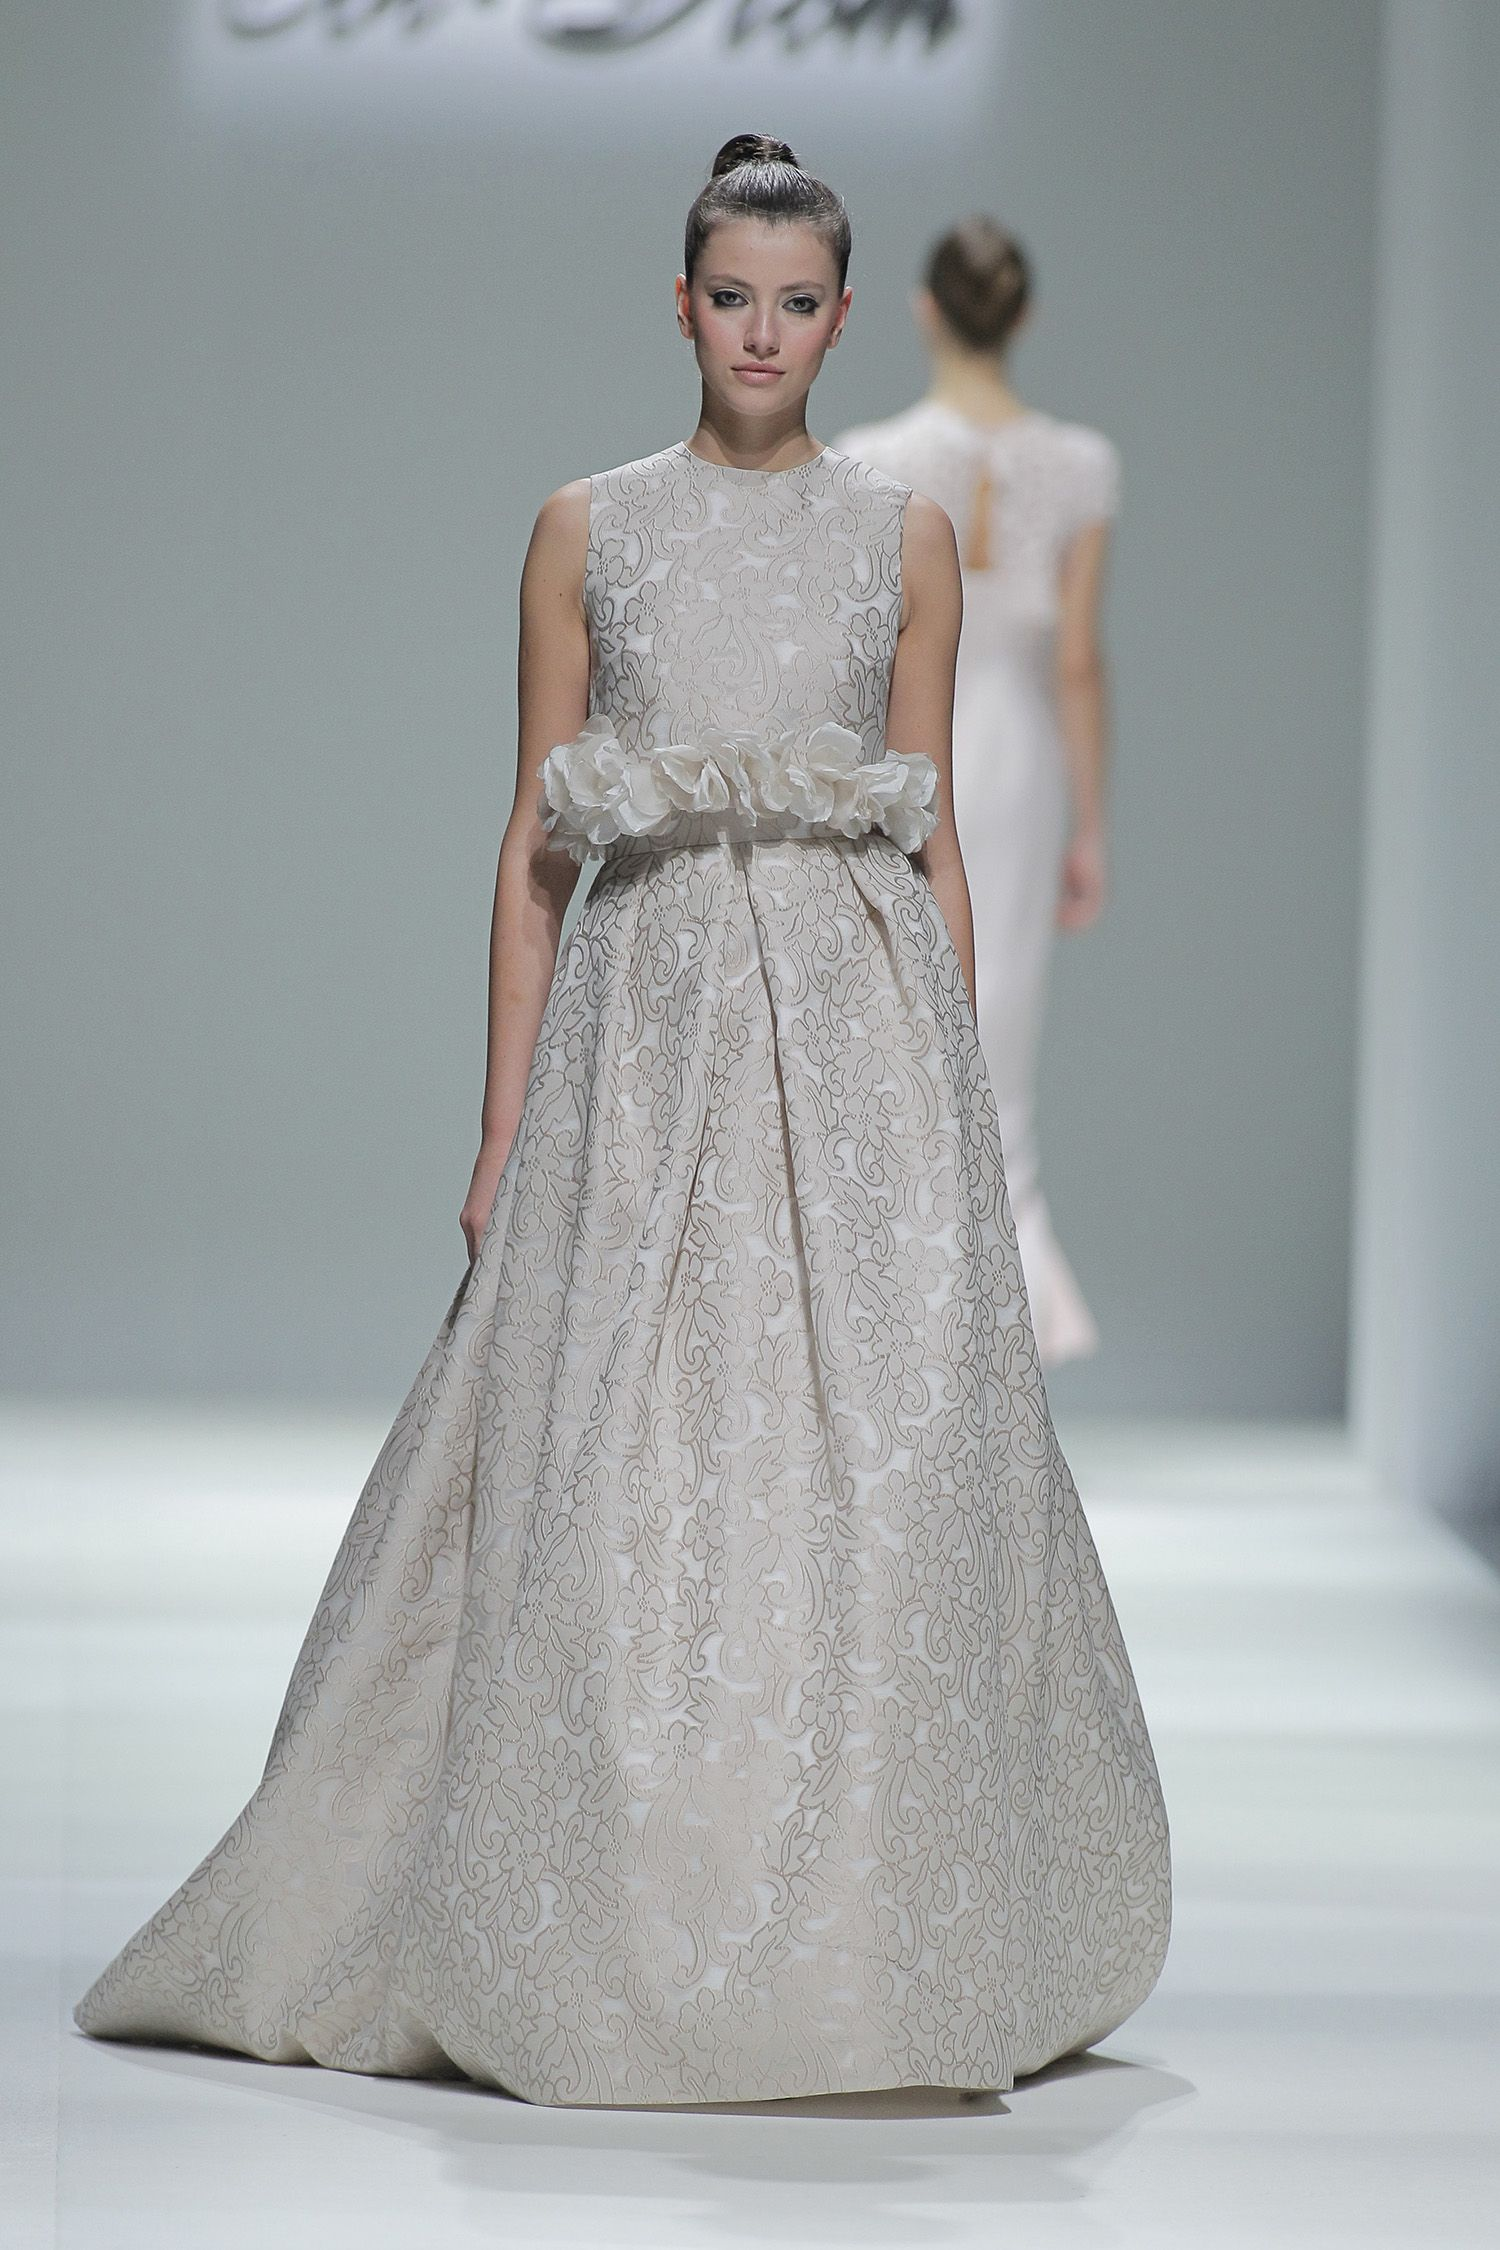 Tot-hom_SS15_73 #tothom #altacostura #elegancia #modamujer #moda ...